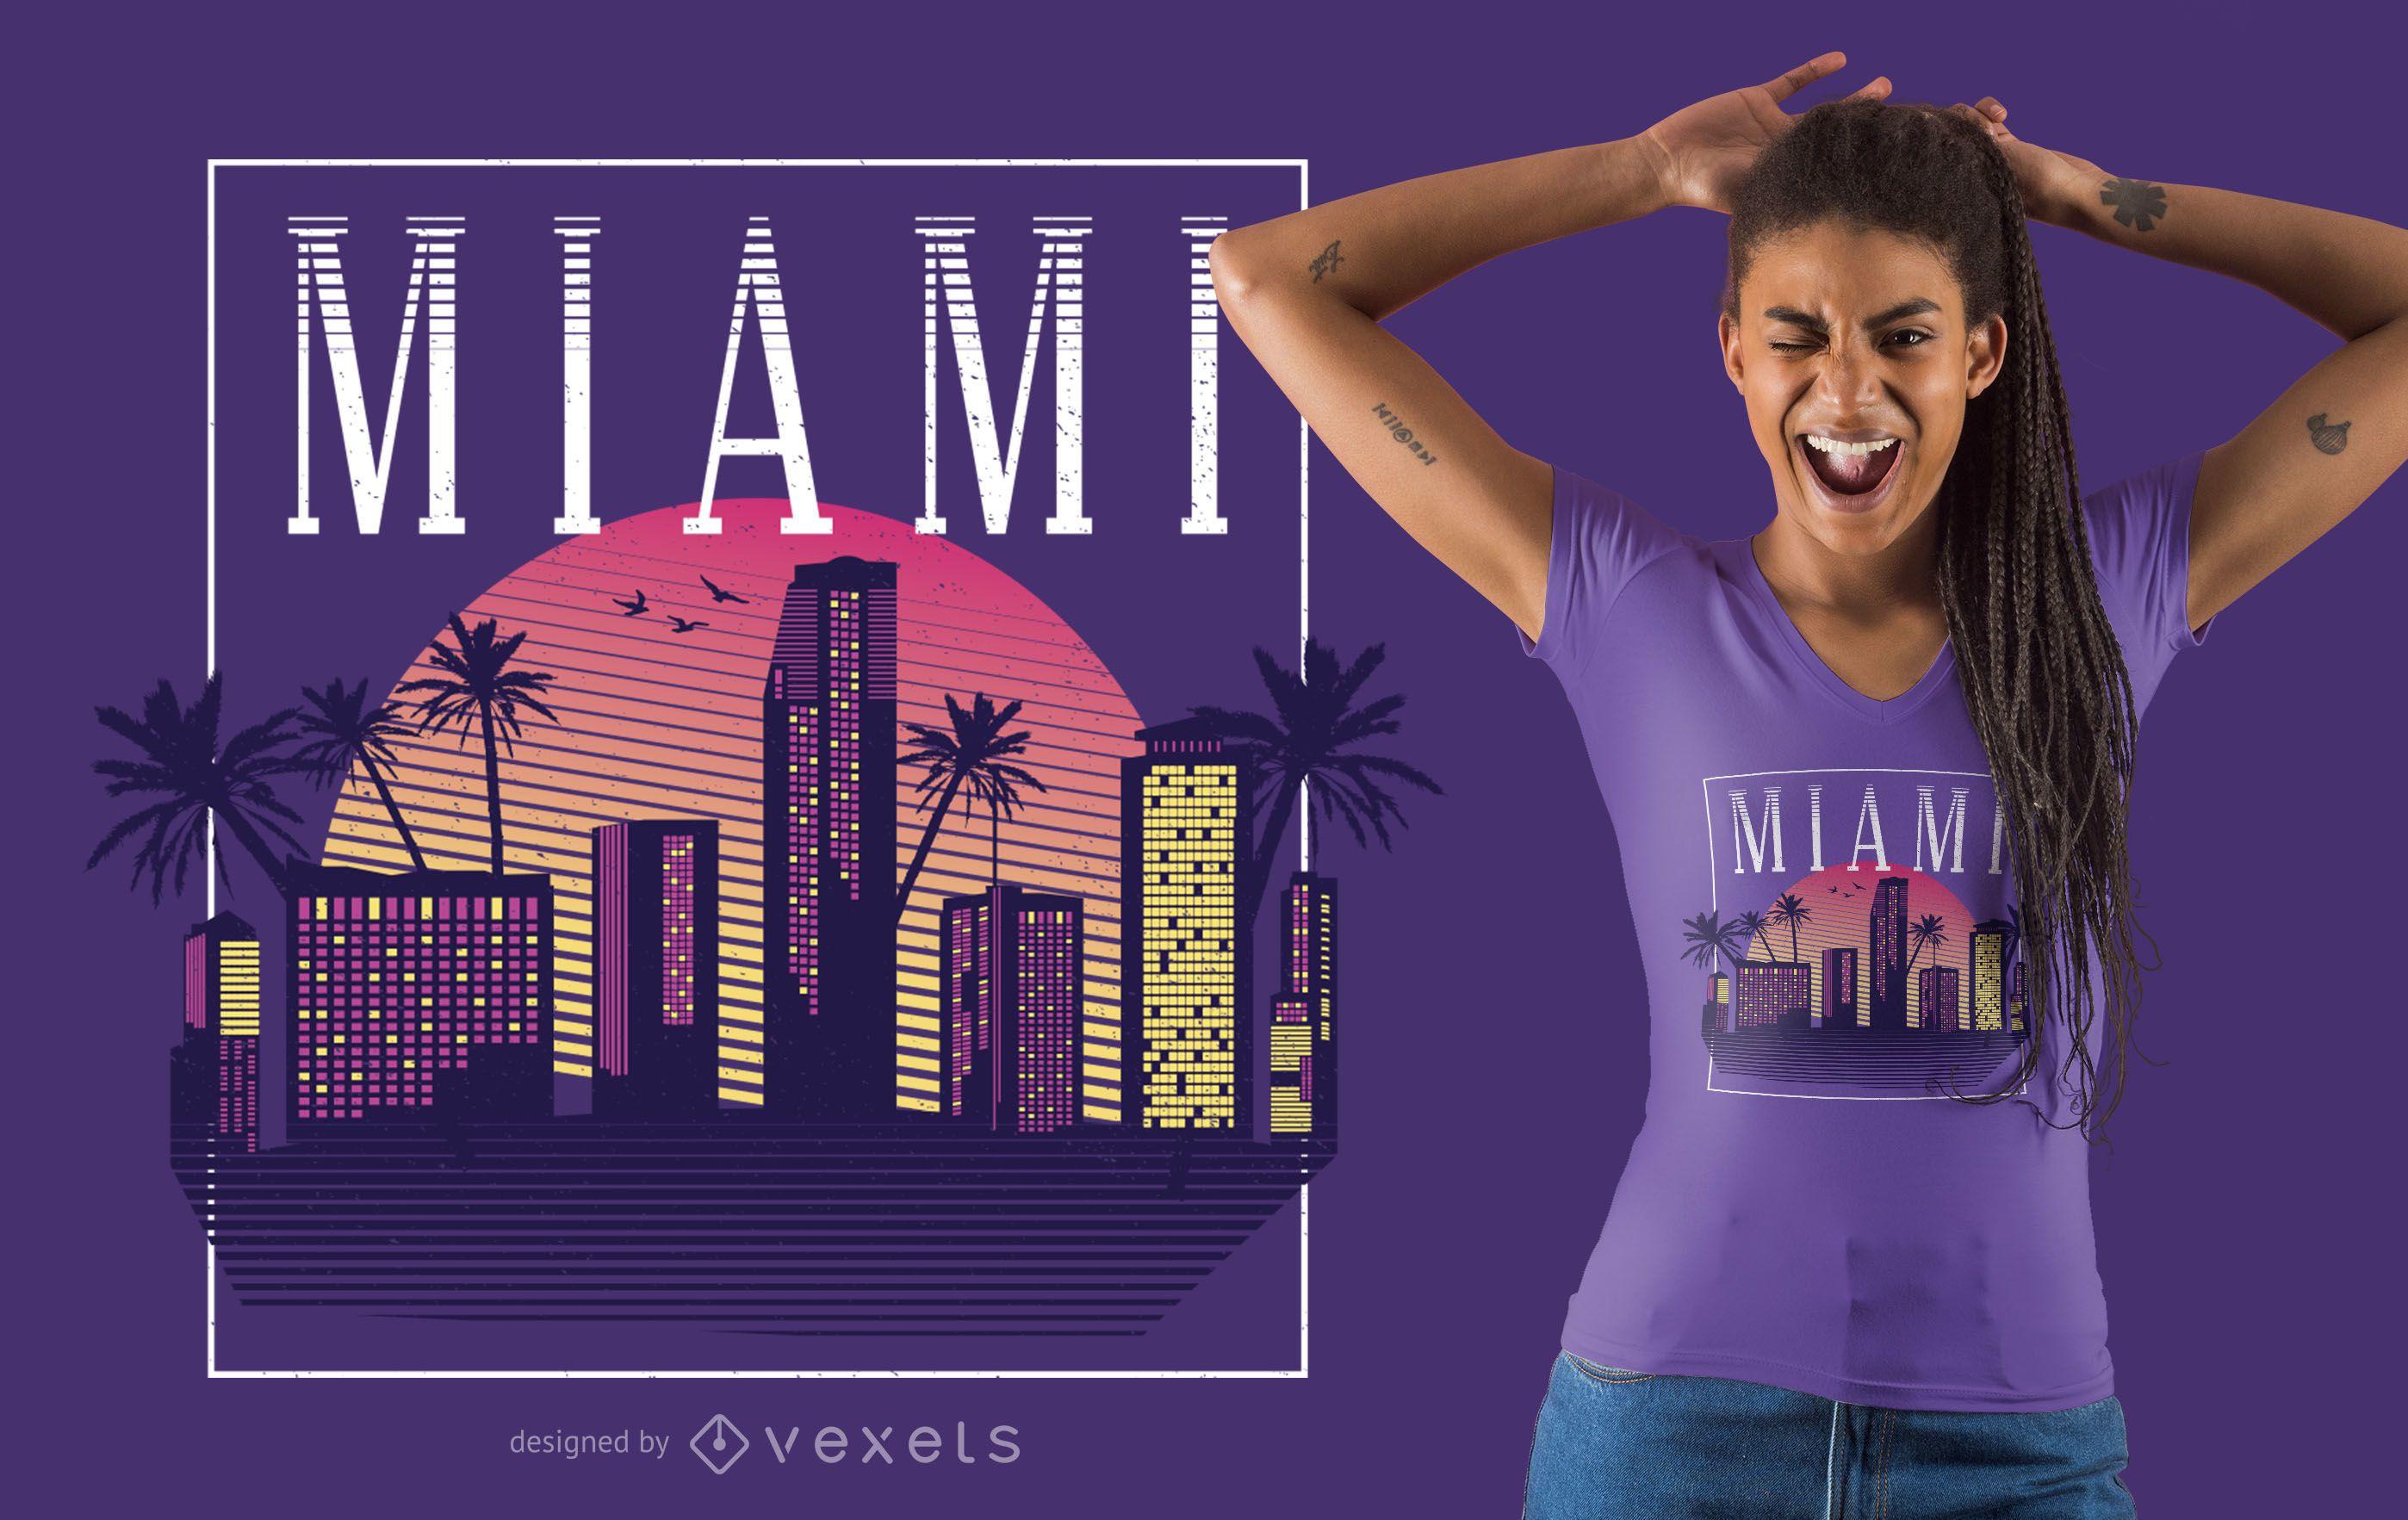 Retro Style Miami T-shirt Design